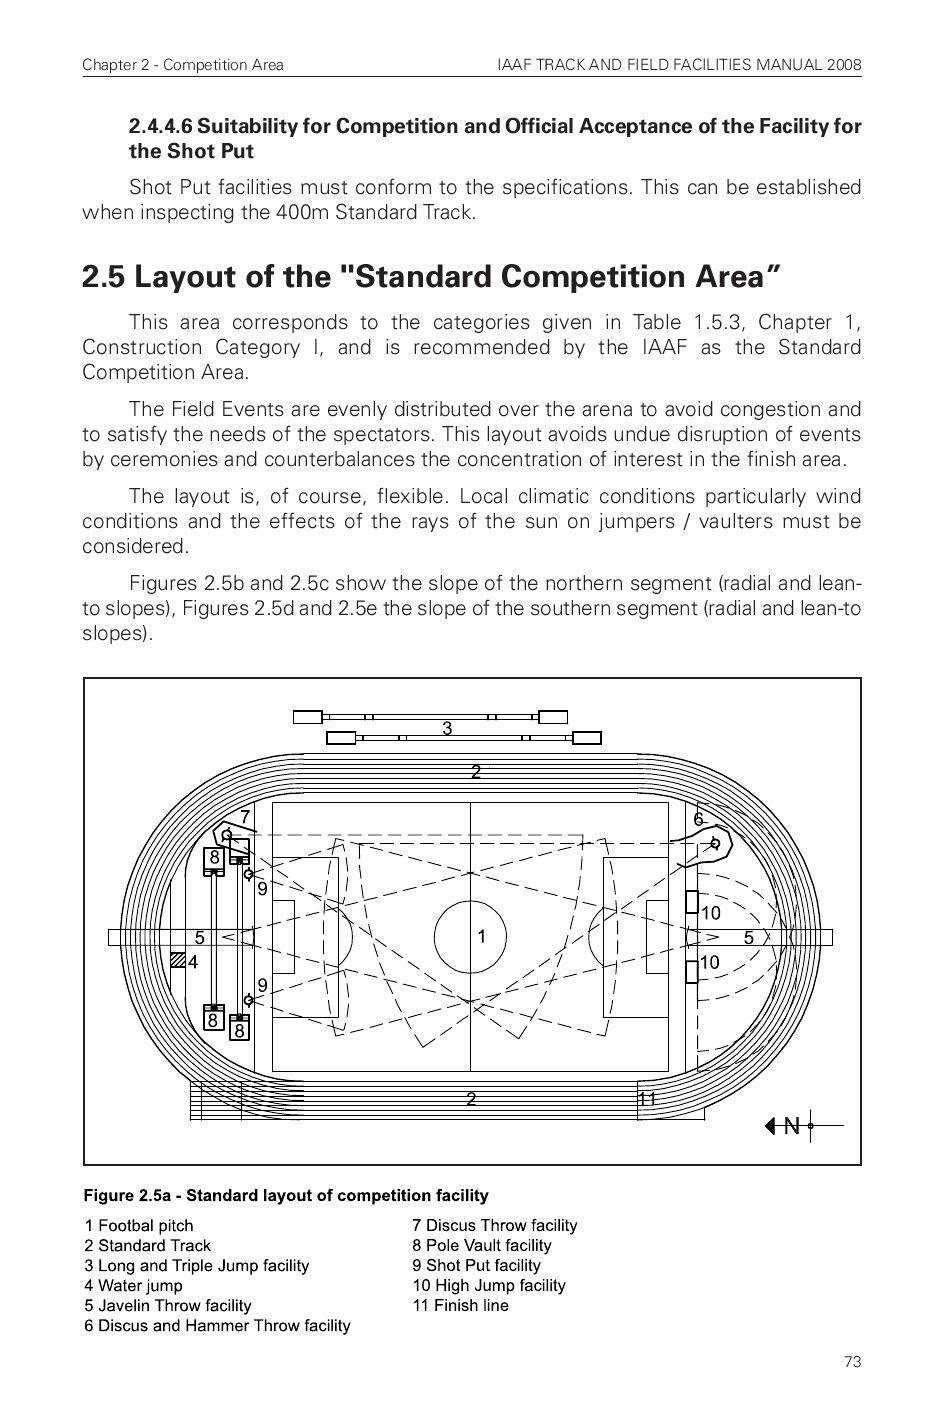 medium resolution of iaaf track and field facilities manual by comite nacional de jueces issuu